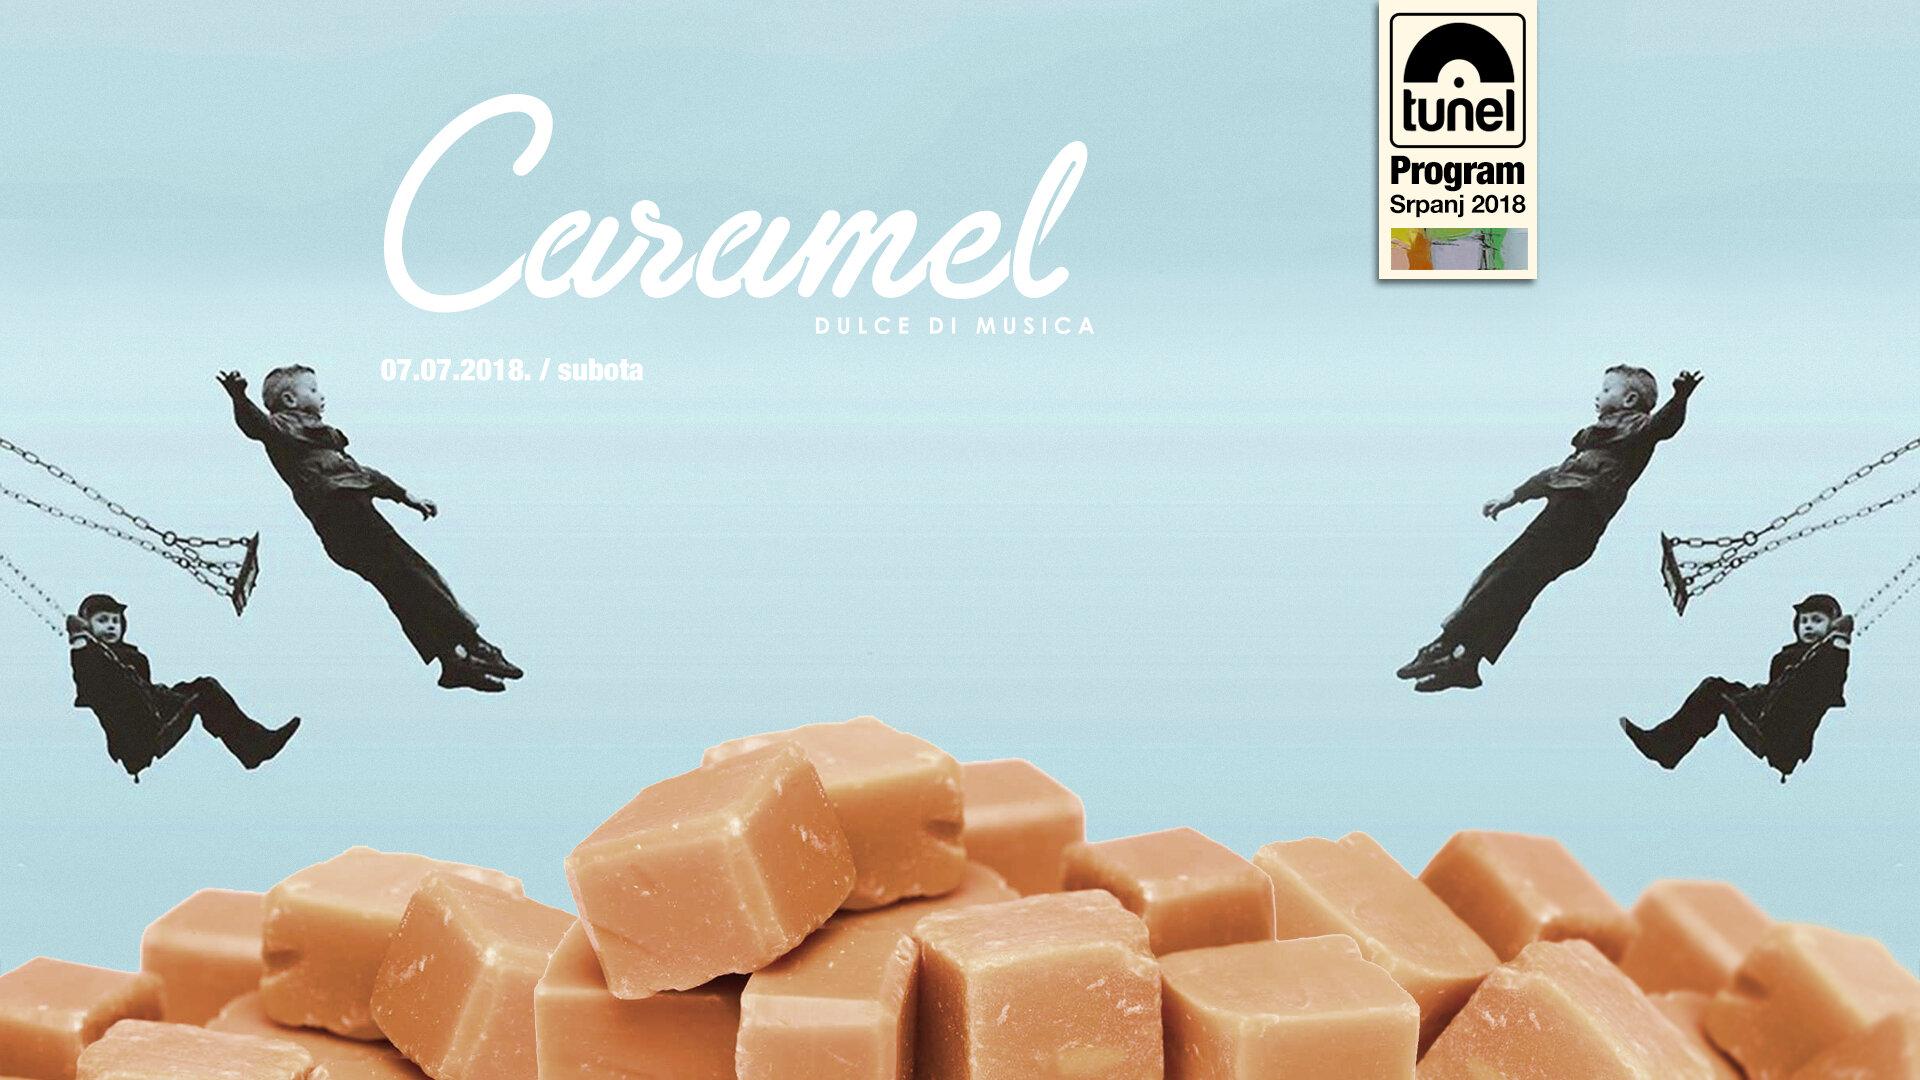 tenel-event-caramel.jpg